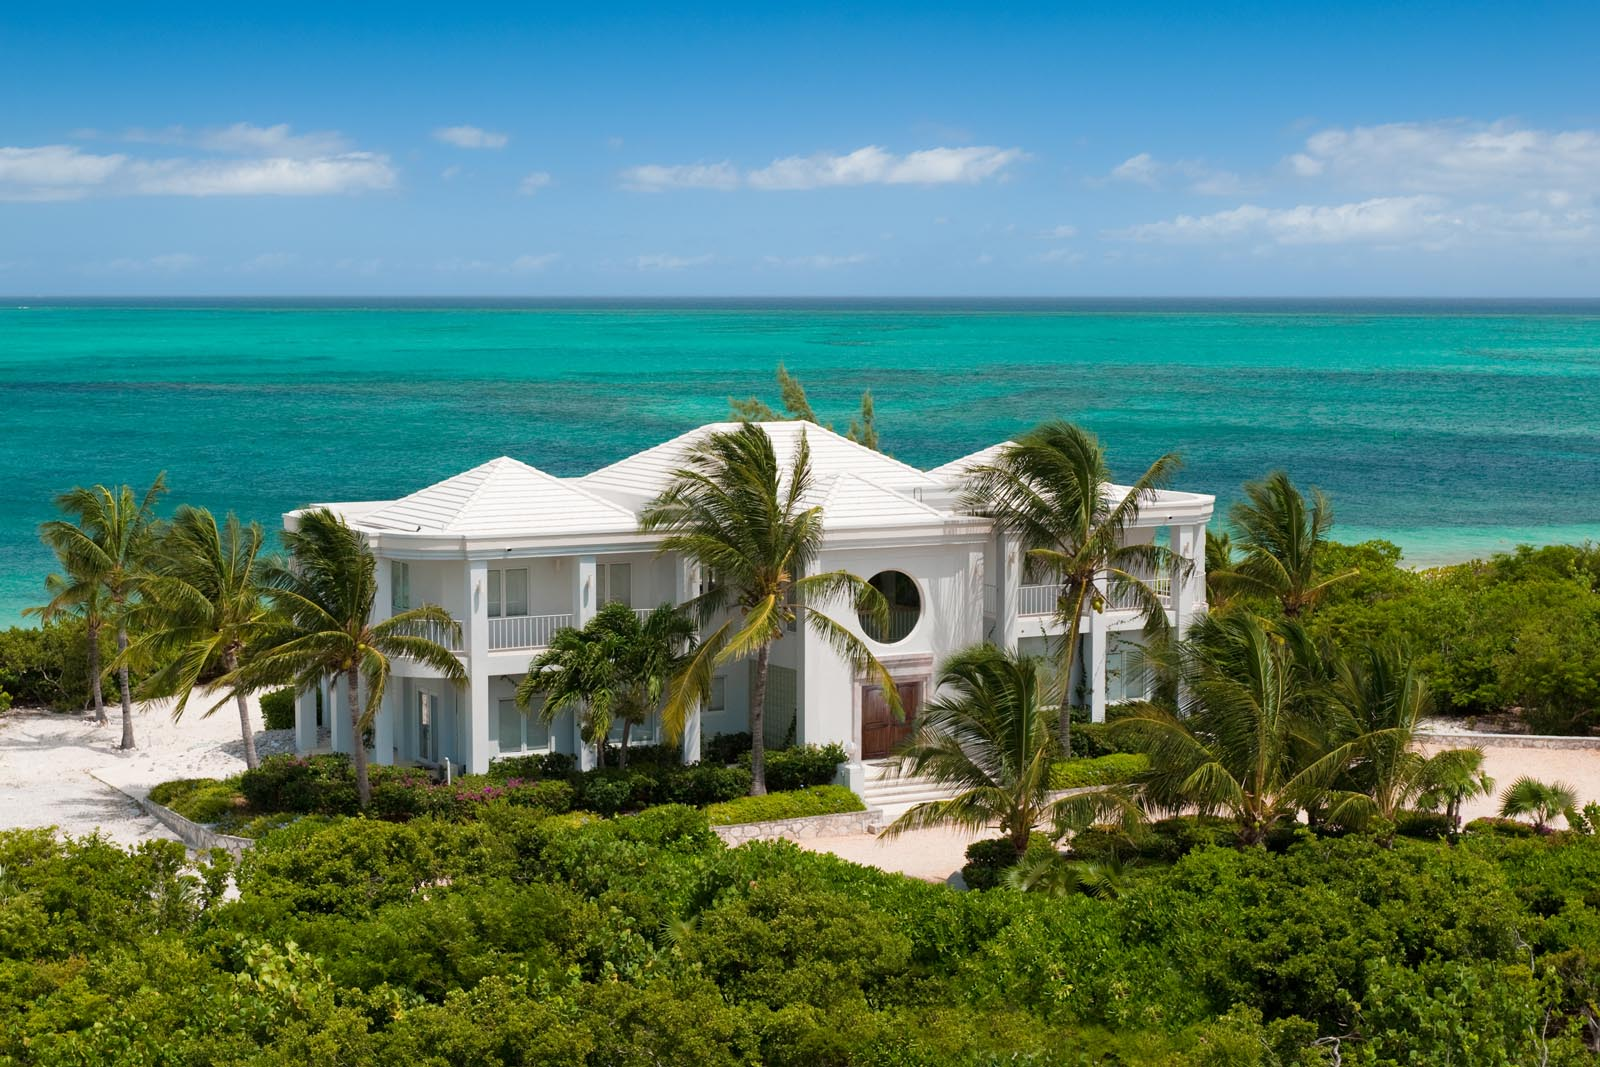 caribique villa rentals announces expansion of turks and caicos